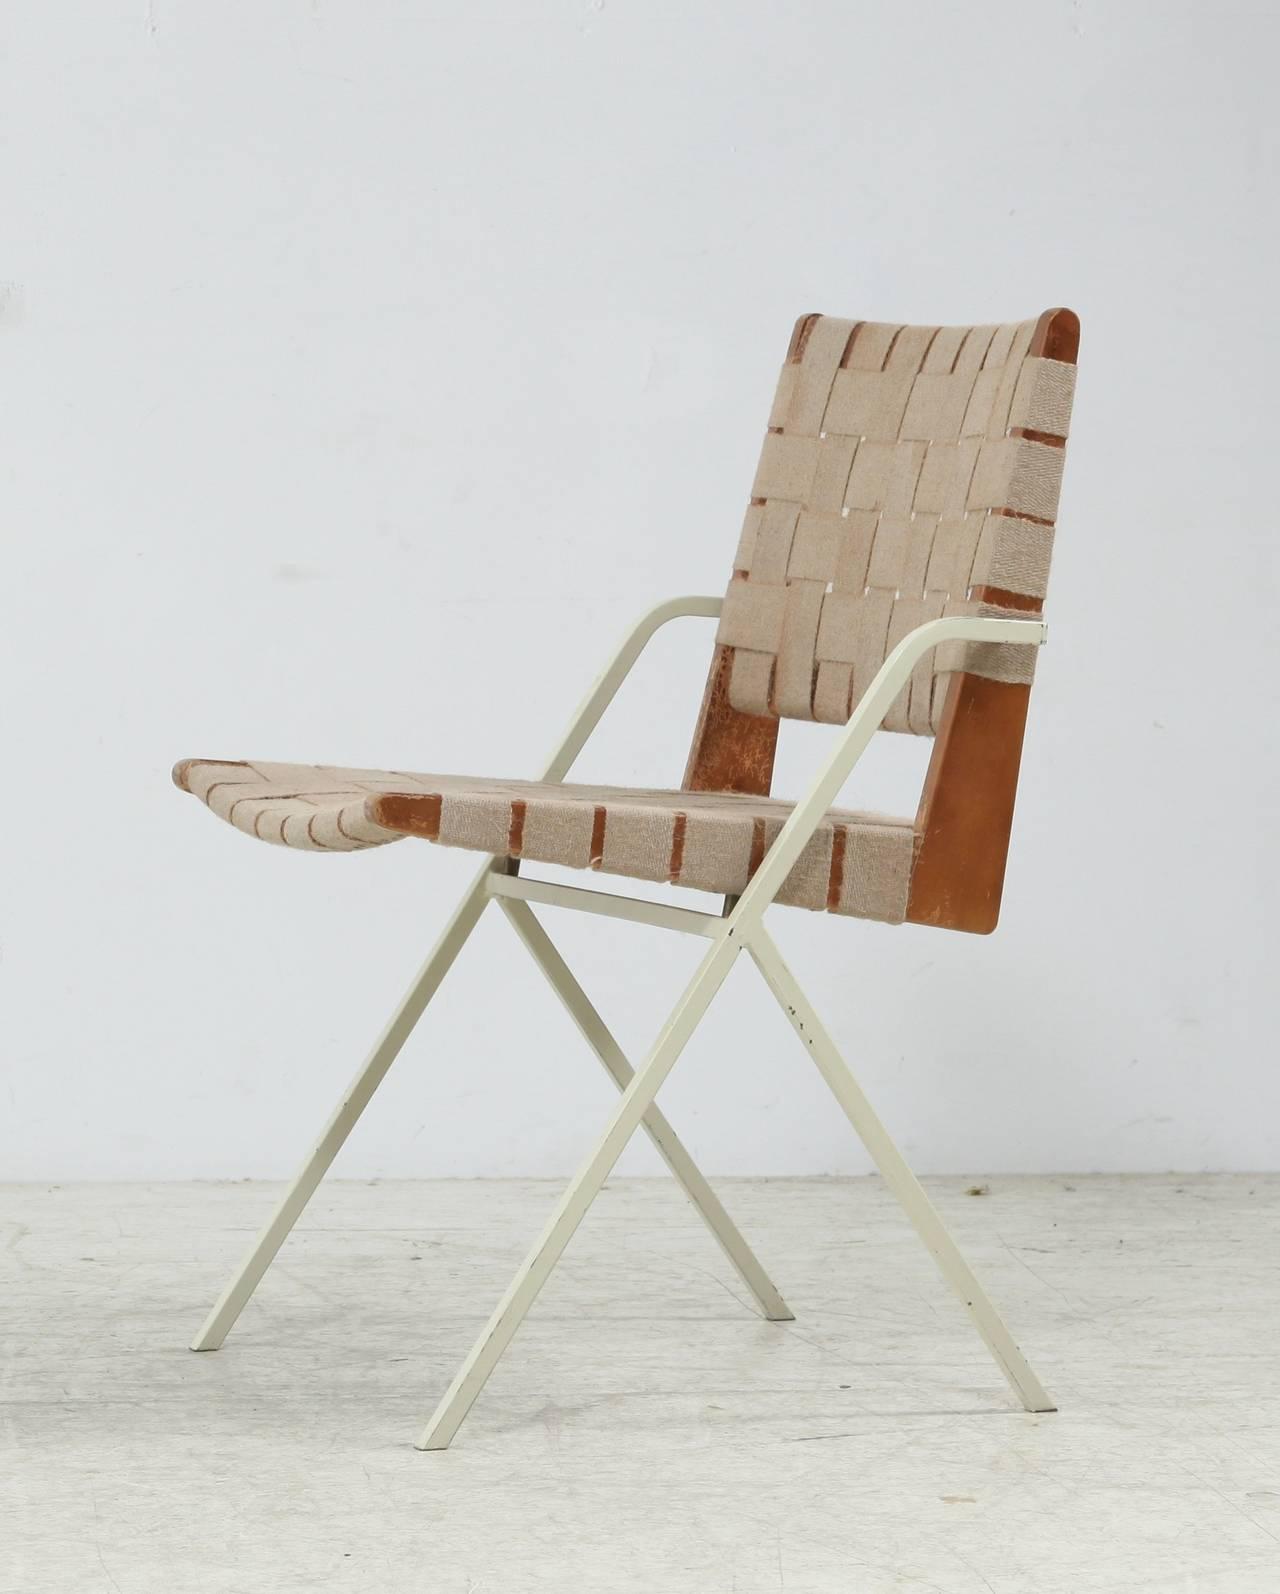 Ladislav Rado Chair with Webbing For Sale at 1stdibs